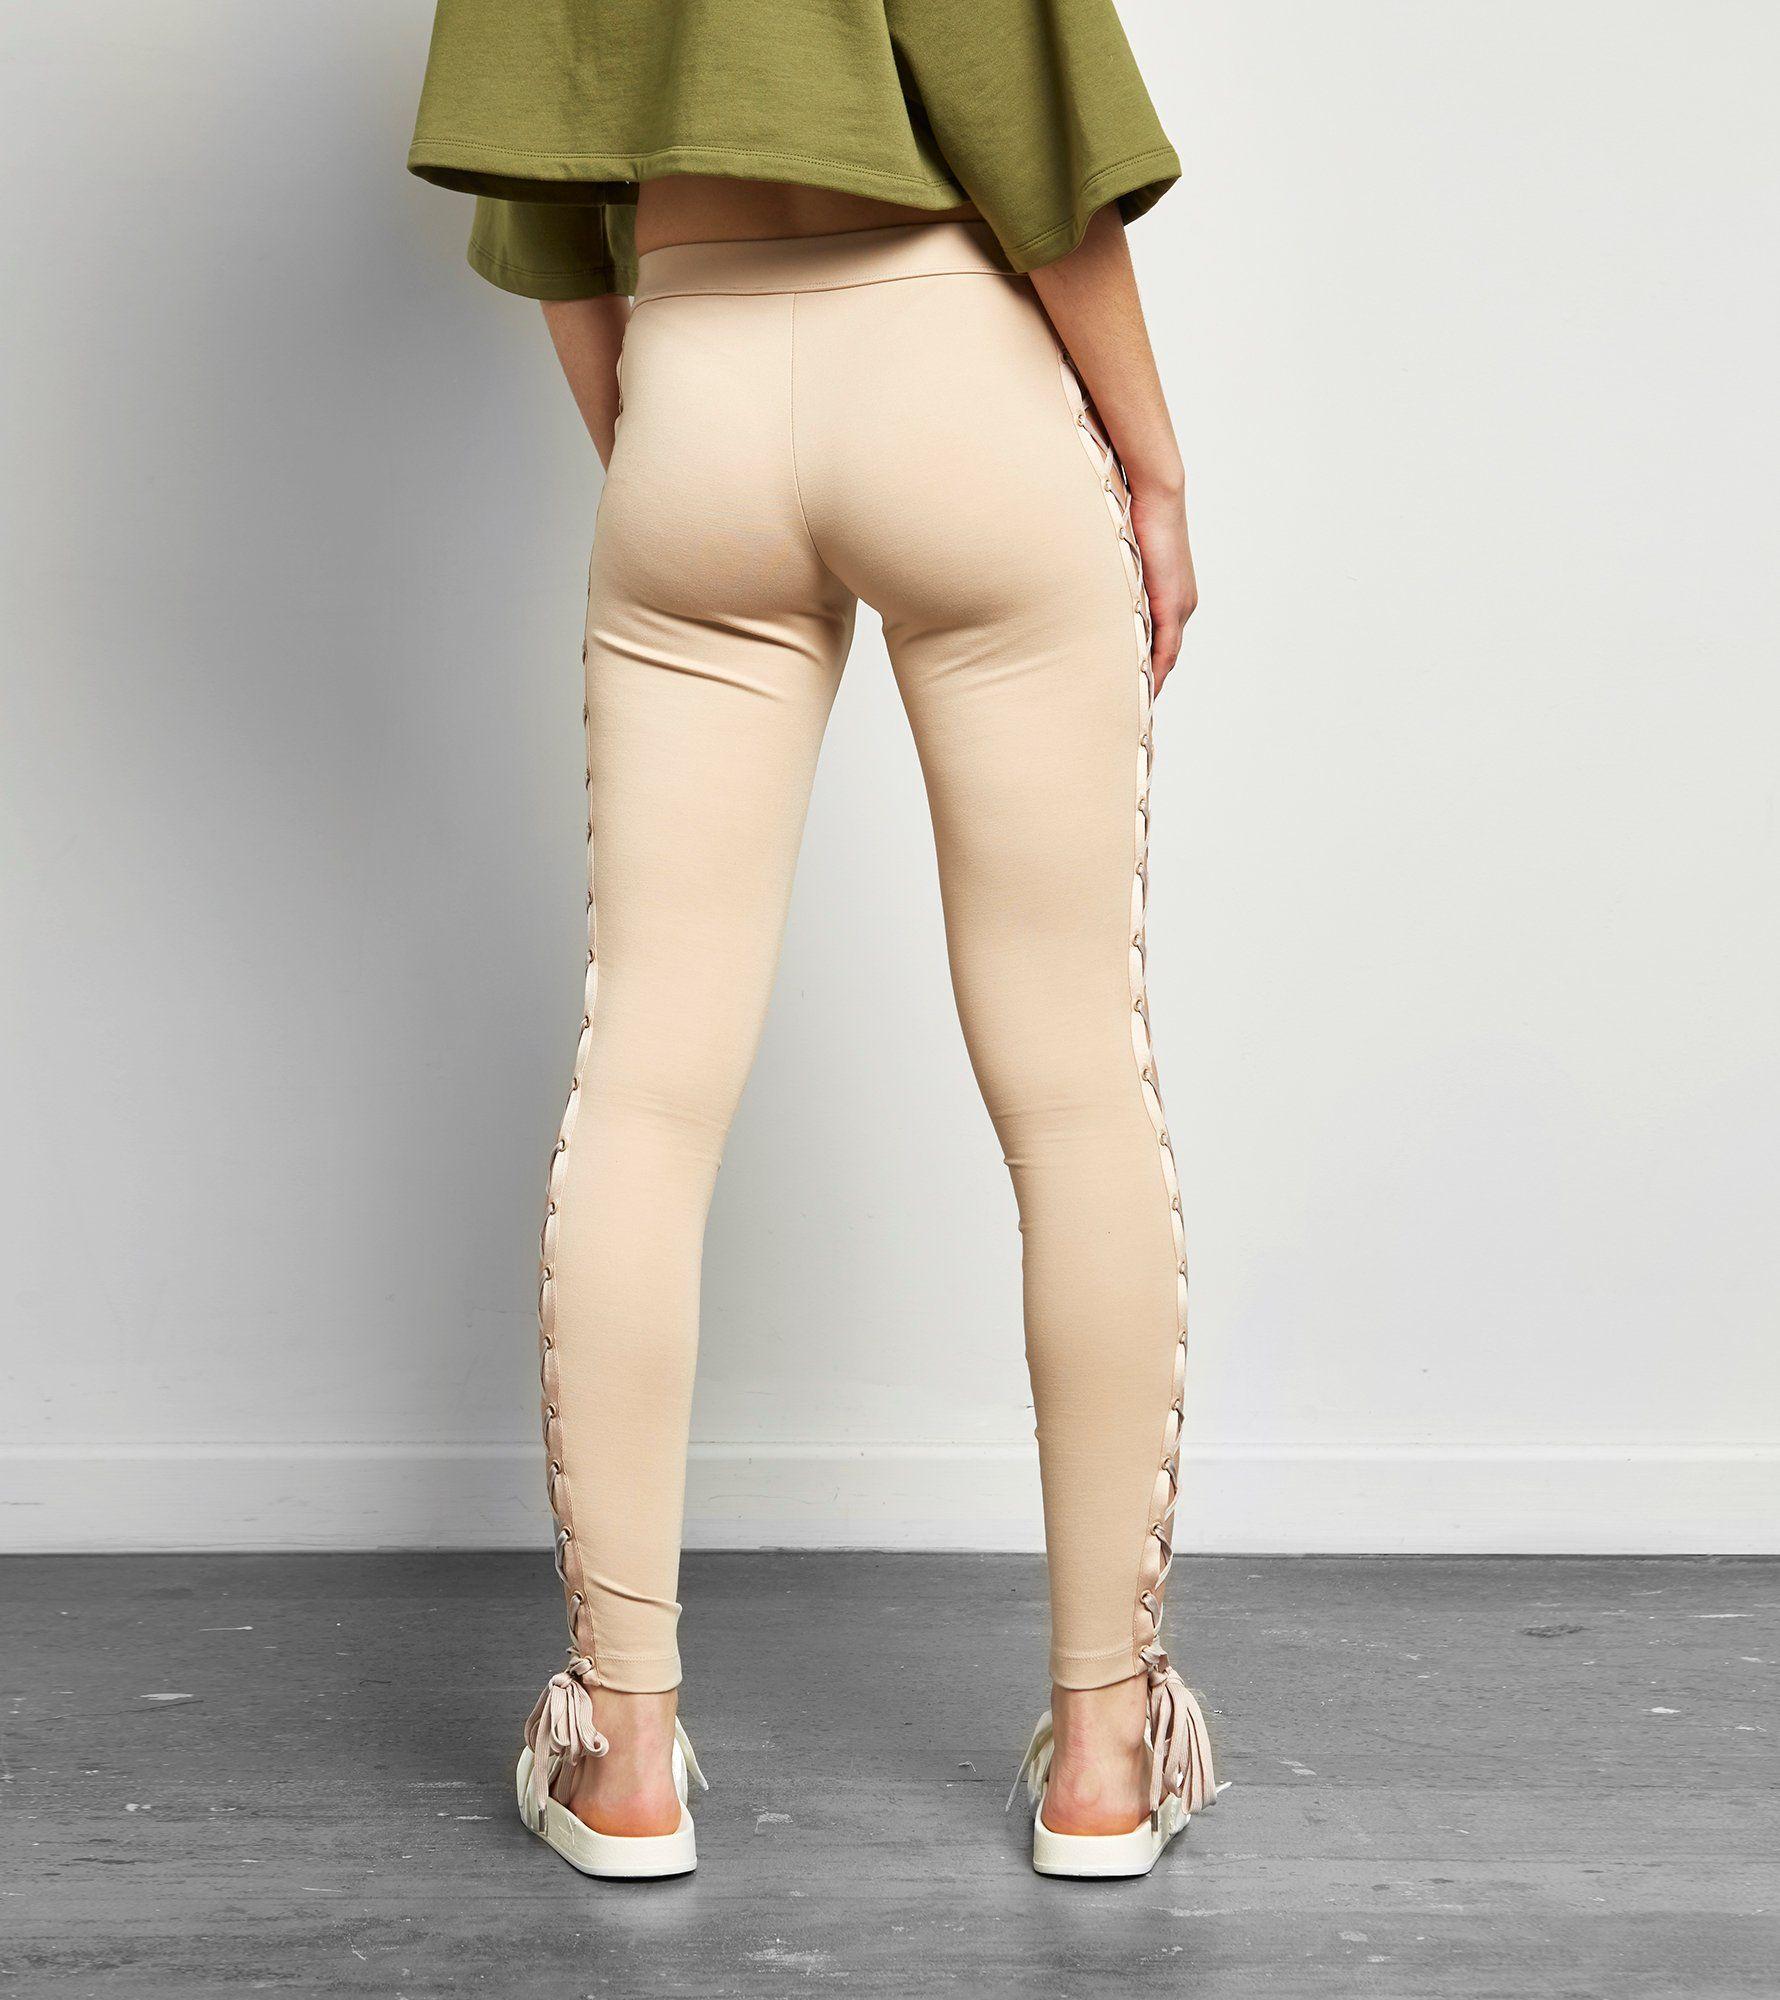 PUMA x Fenty Lace Tights